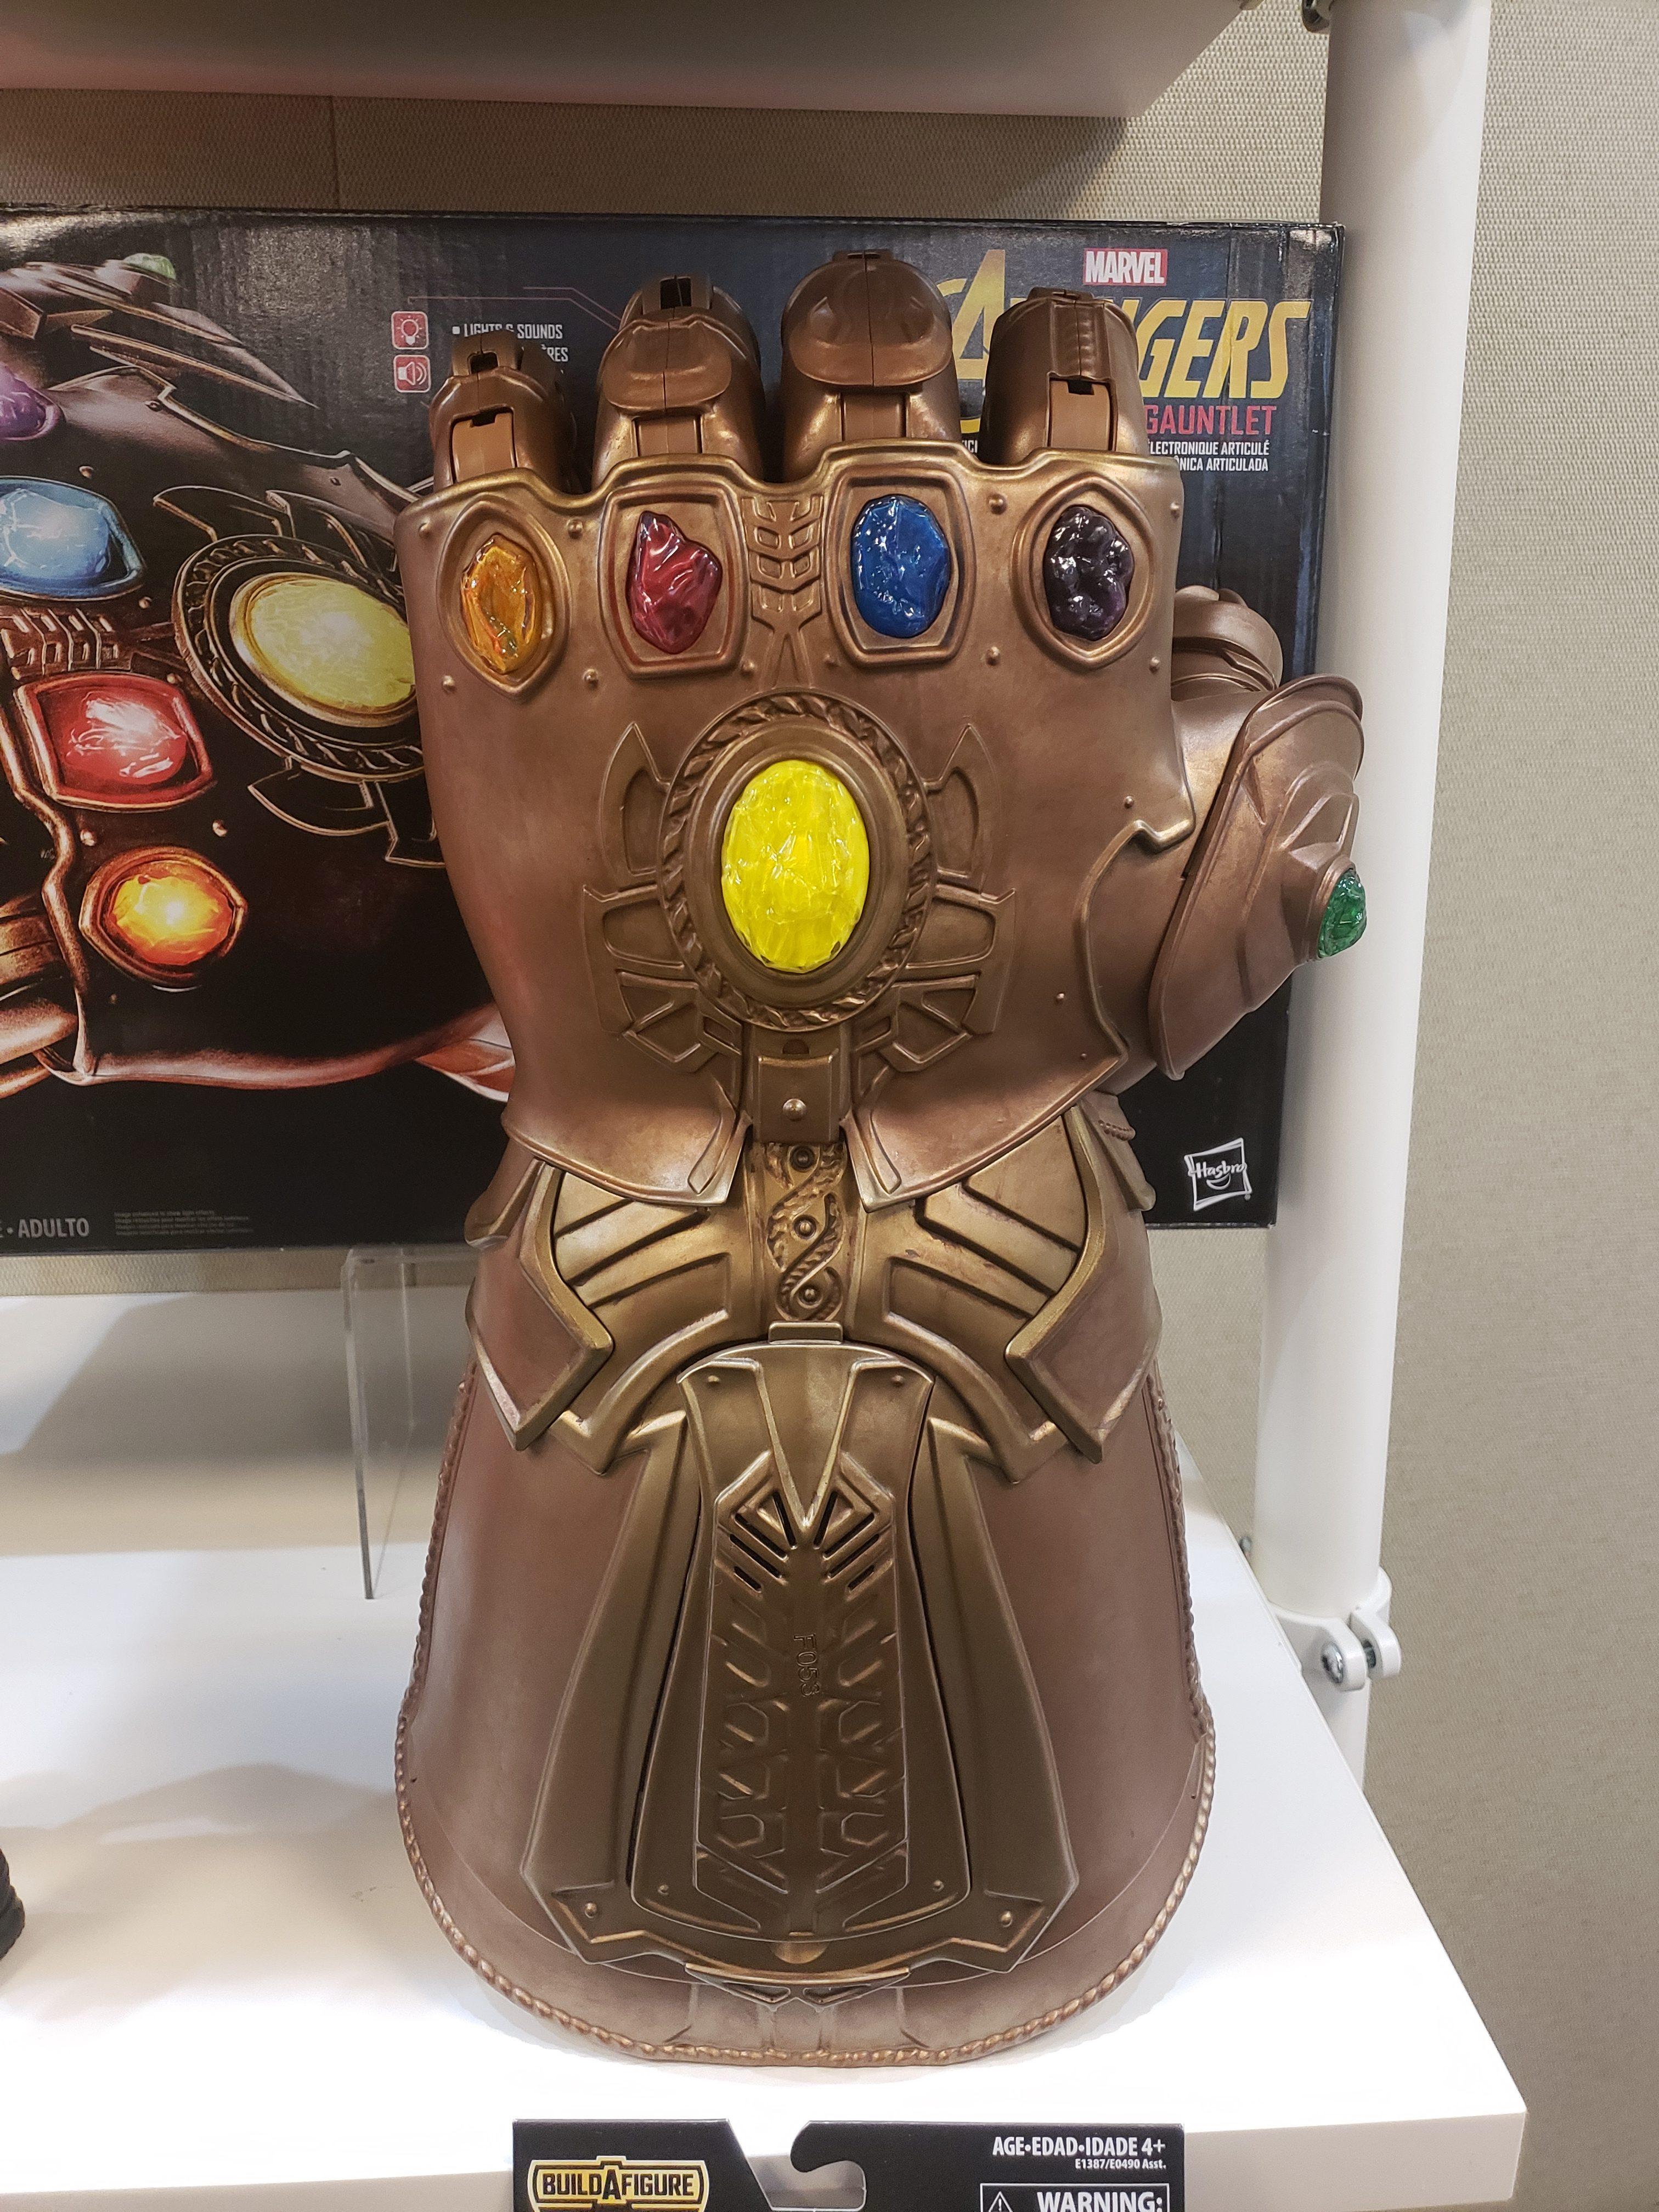 Avengers merchandise, Thanos Infinity Stone Gauntlet